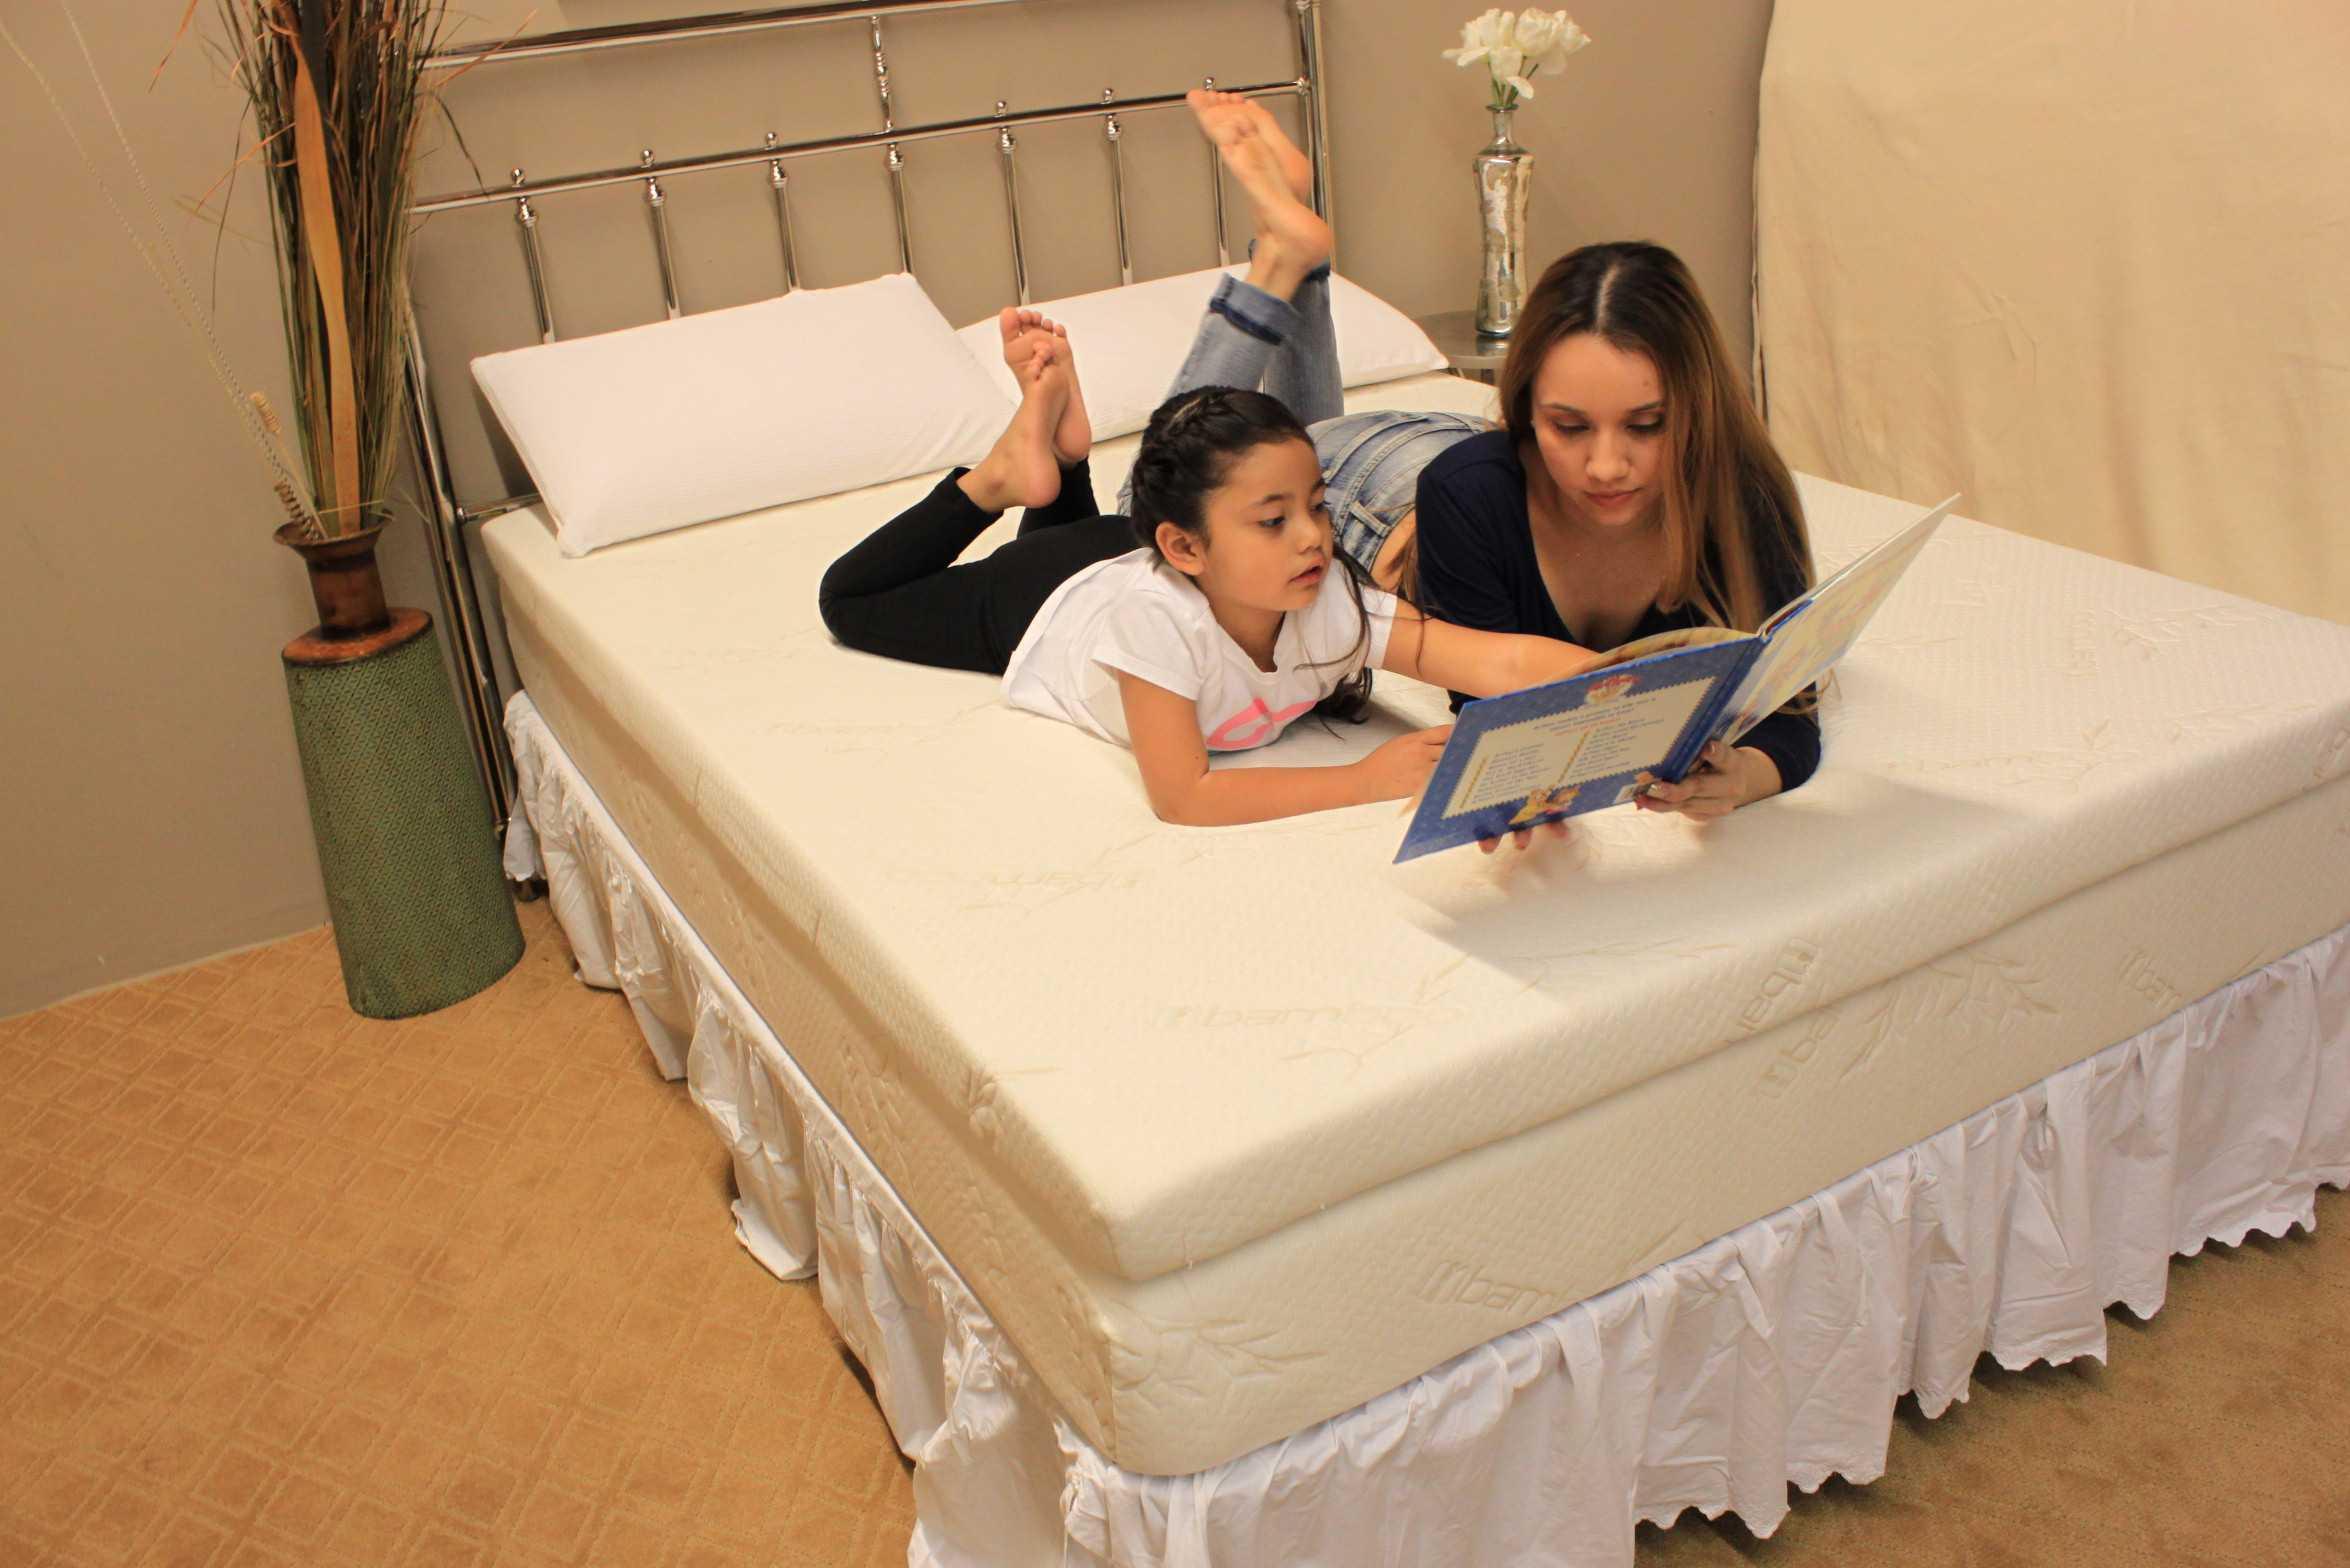 Latex Mattresses Mattress Toppers And Pillows